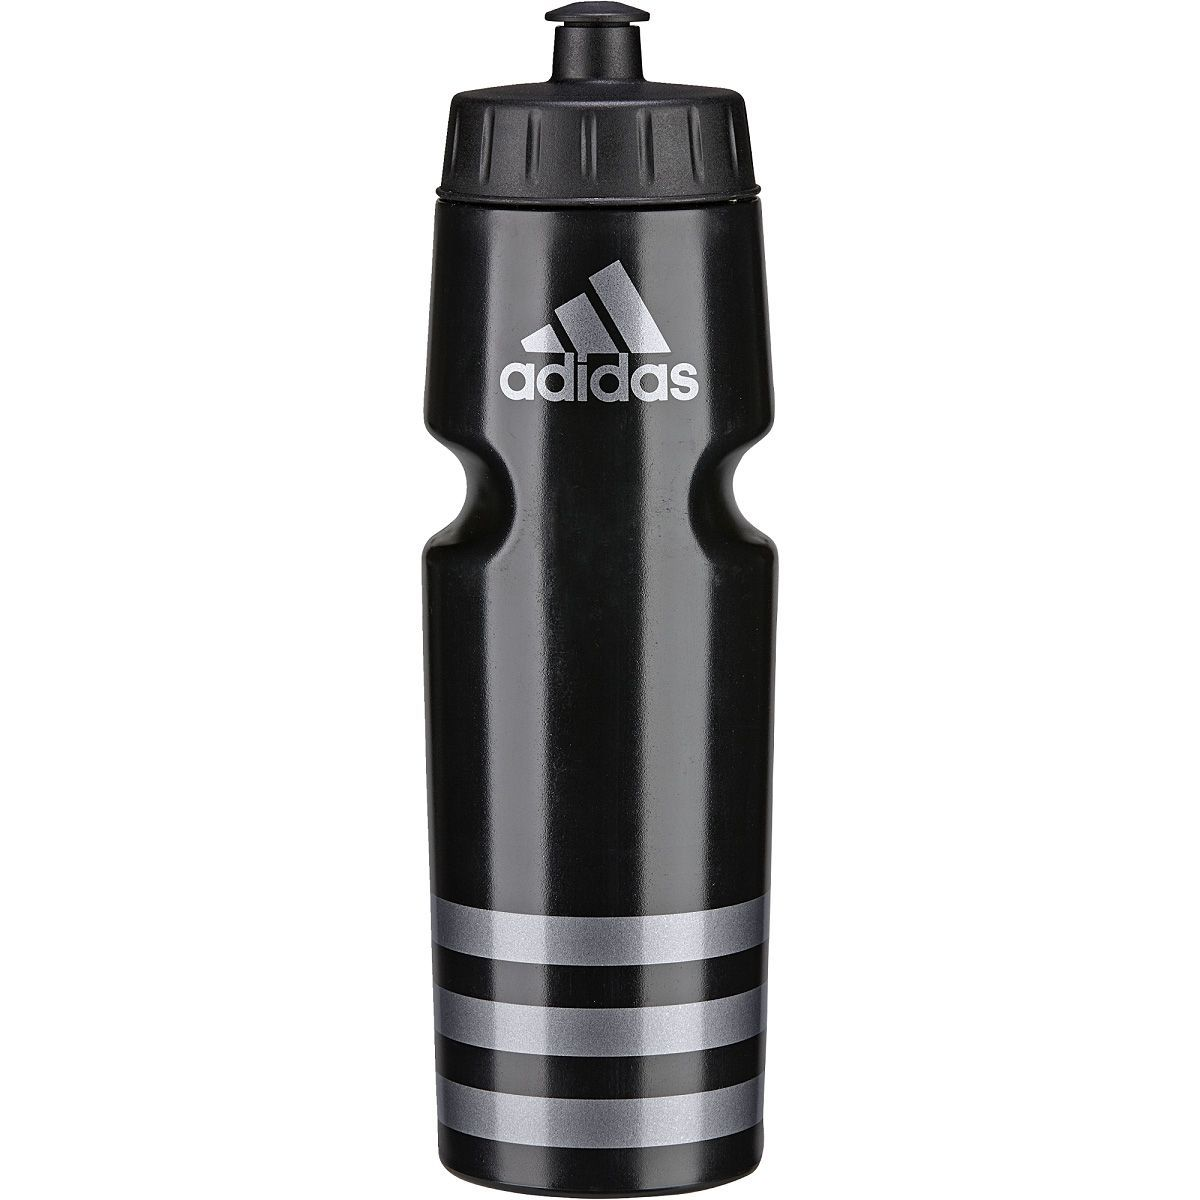 Adidas Adidas Performance Bottle in Black/Silver Sports